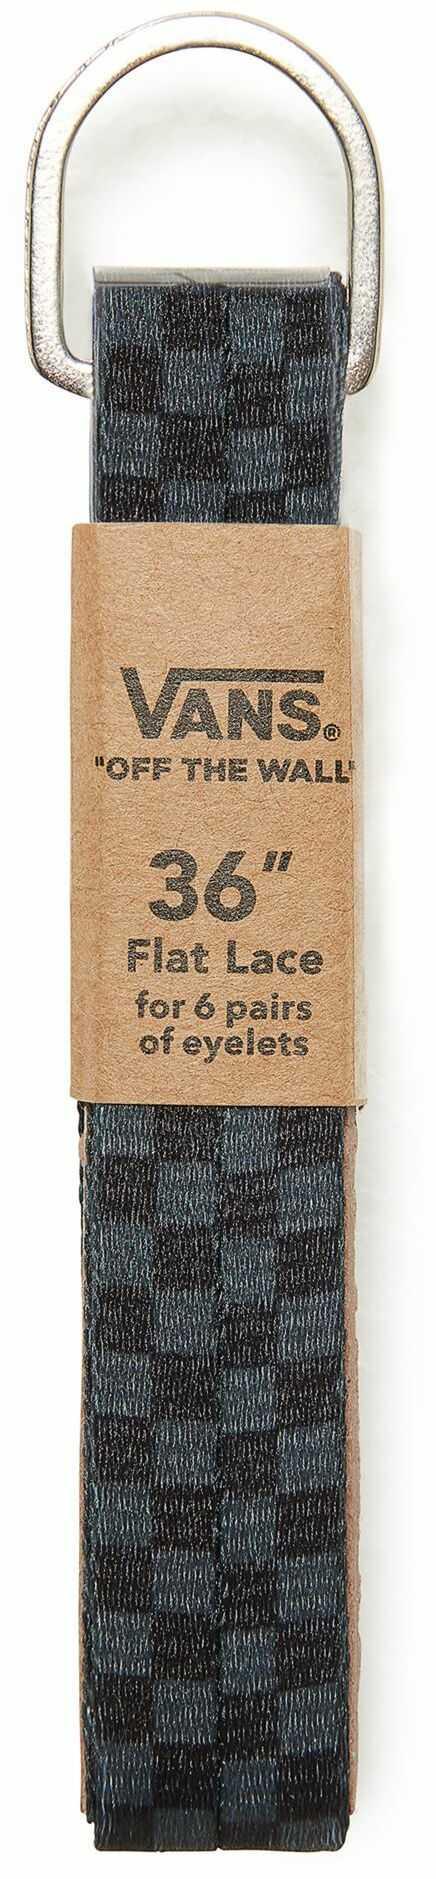 sznurowadła VANS FLAT LACES 36 Black/Charcoal